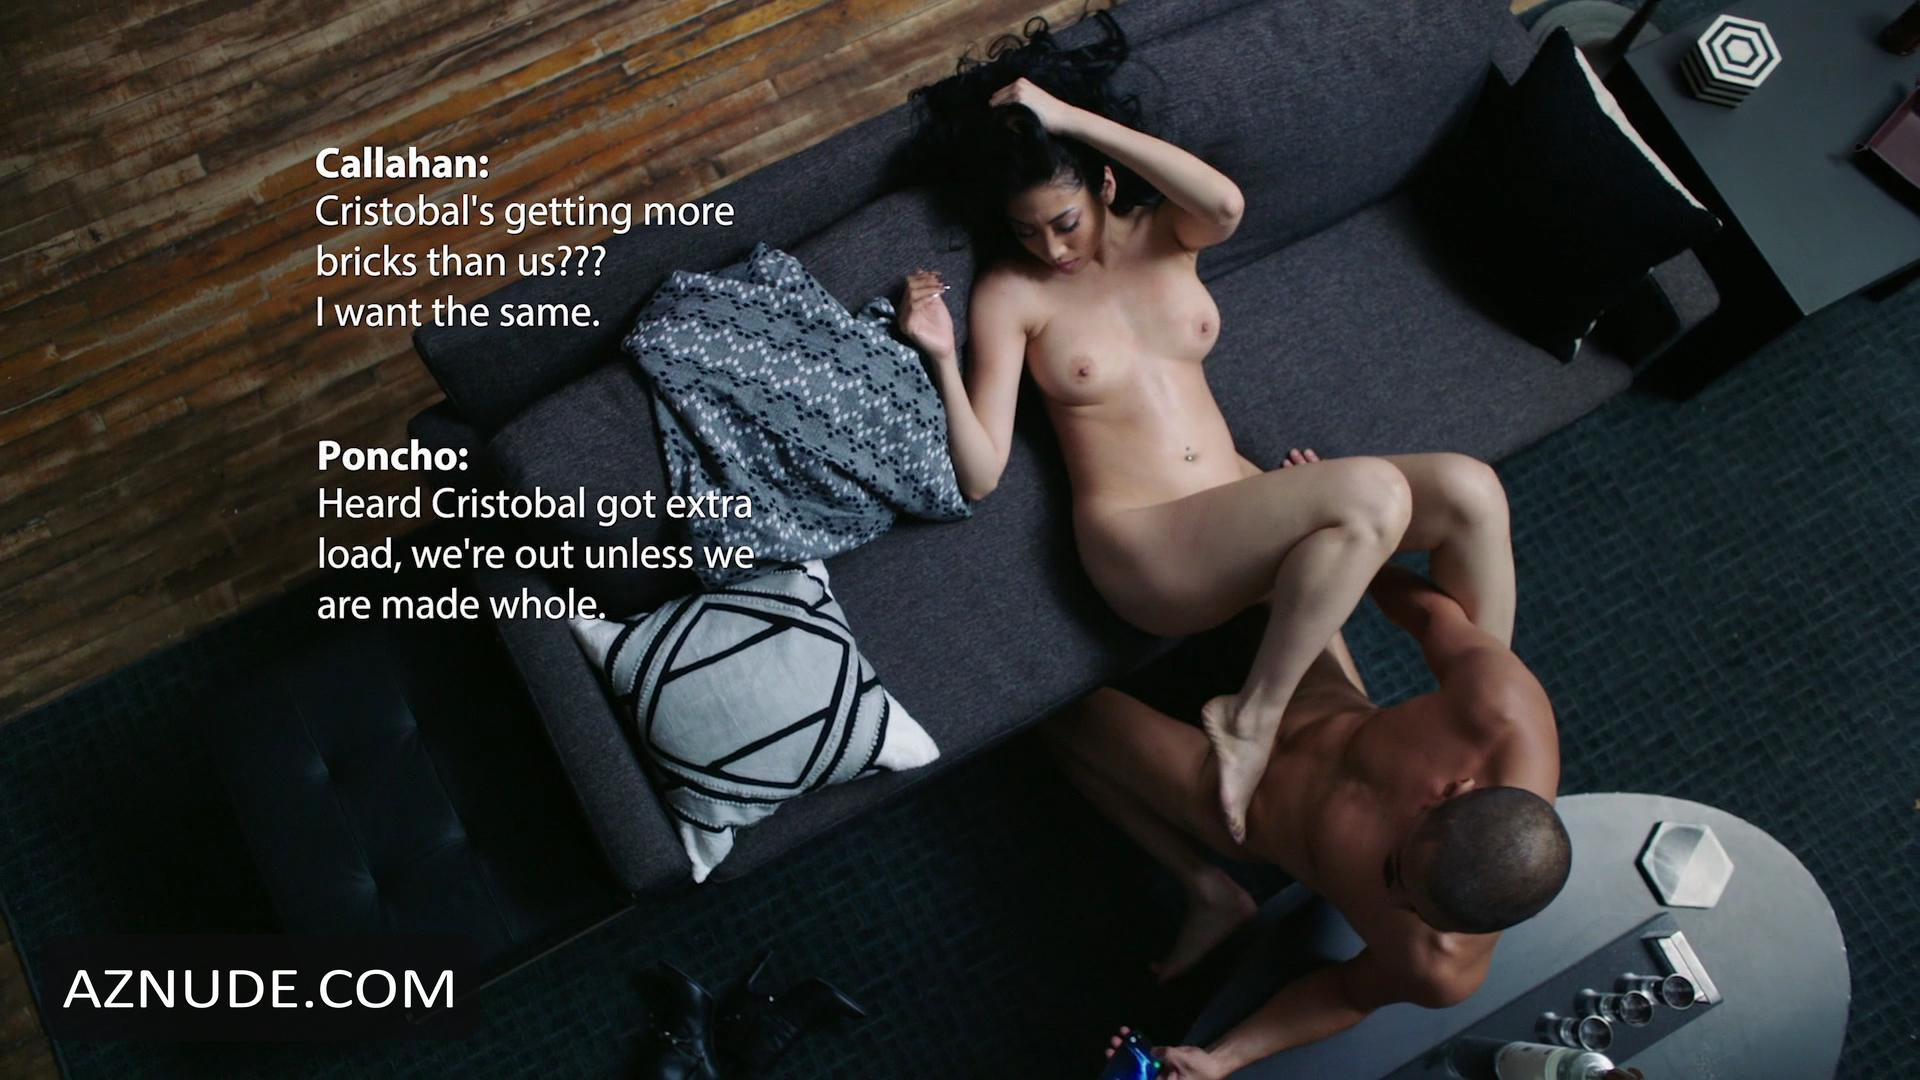 Aprendiz Porn showing porn images for nicholas ramirez porn | www.porndaa